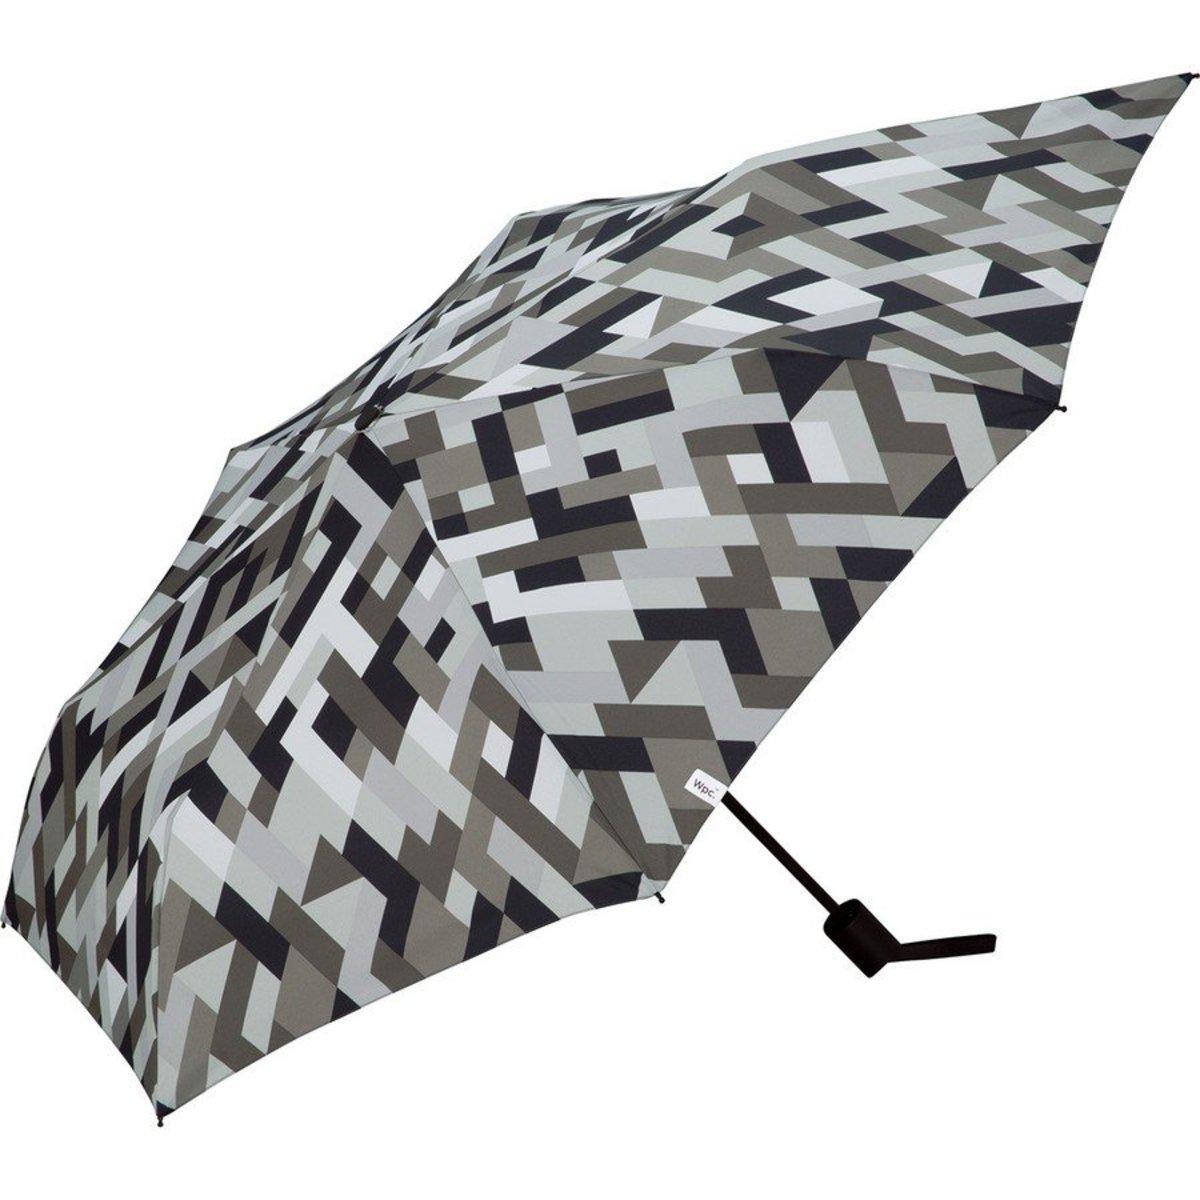 Back Protect Folding Umbrella - Geometry Gray (MSS-056)